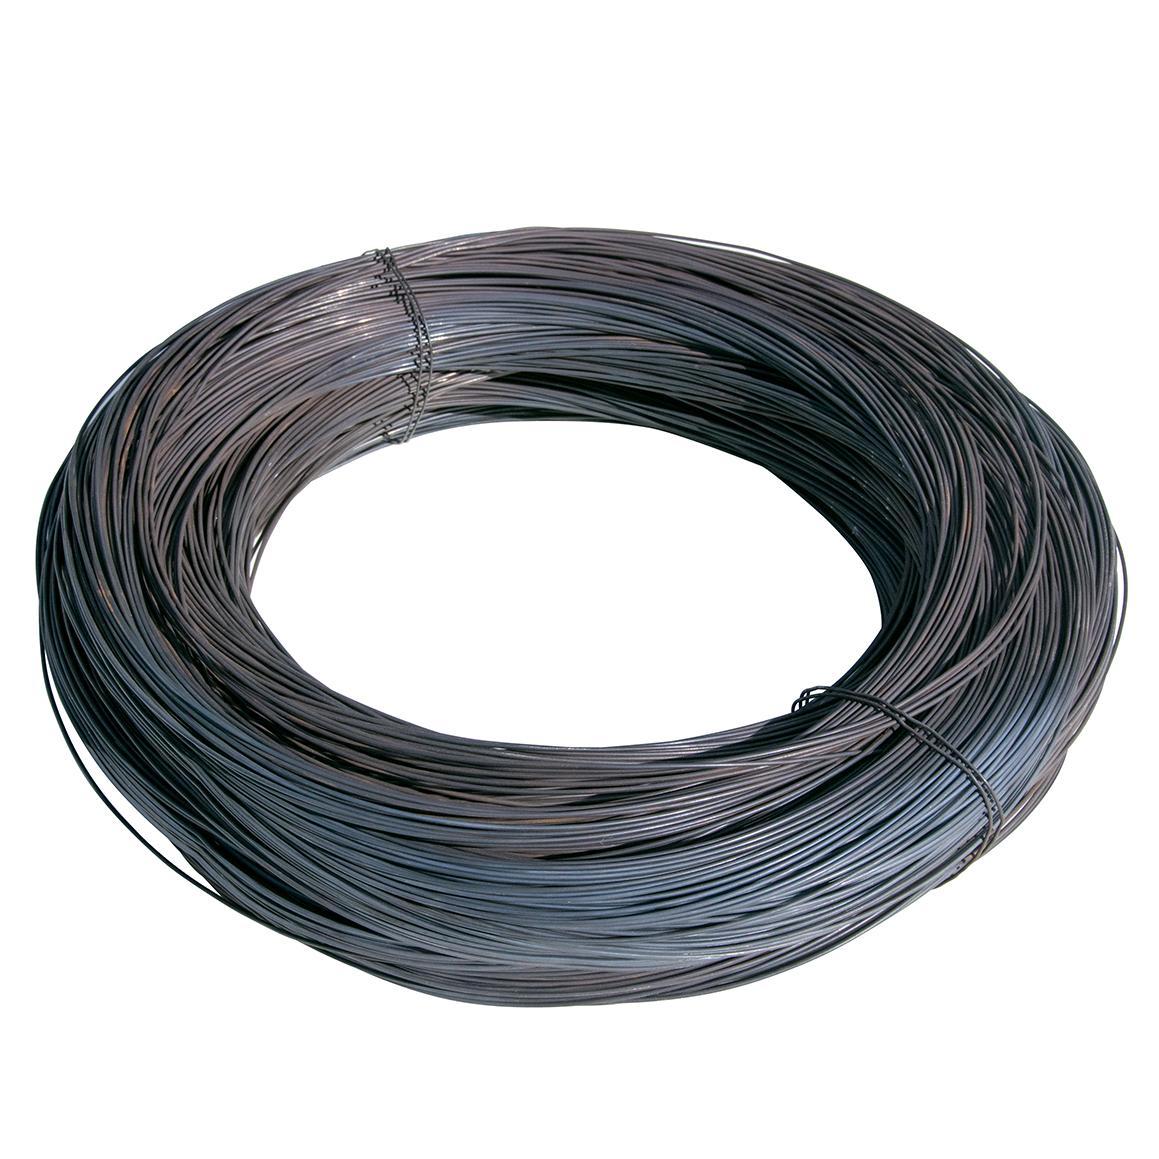 Tying Wire